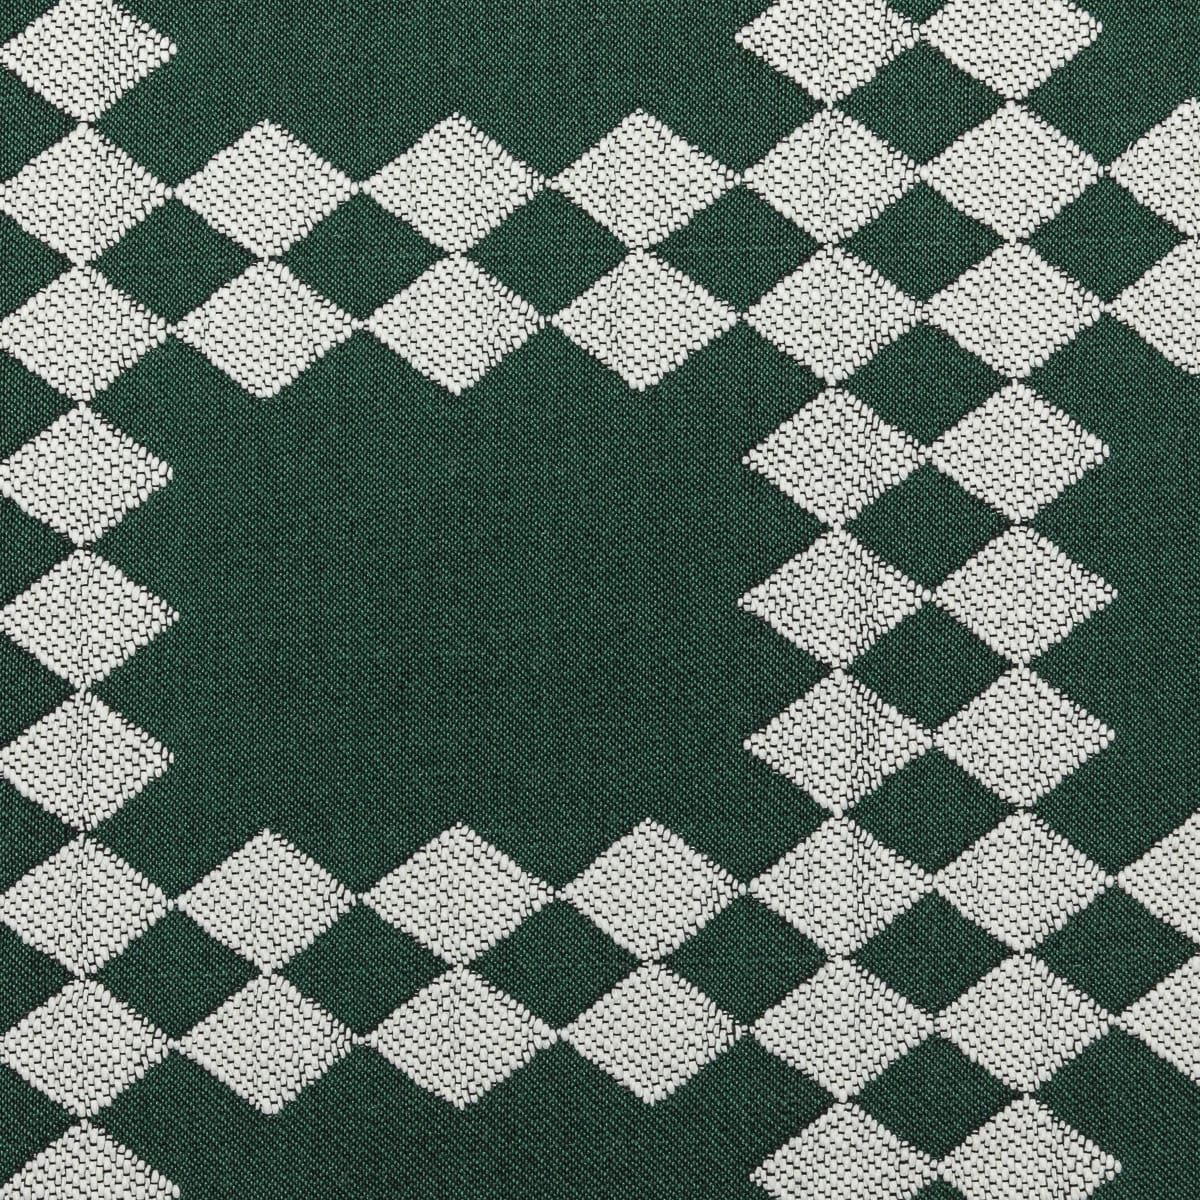 Green chess